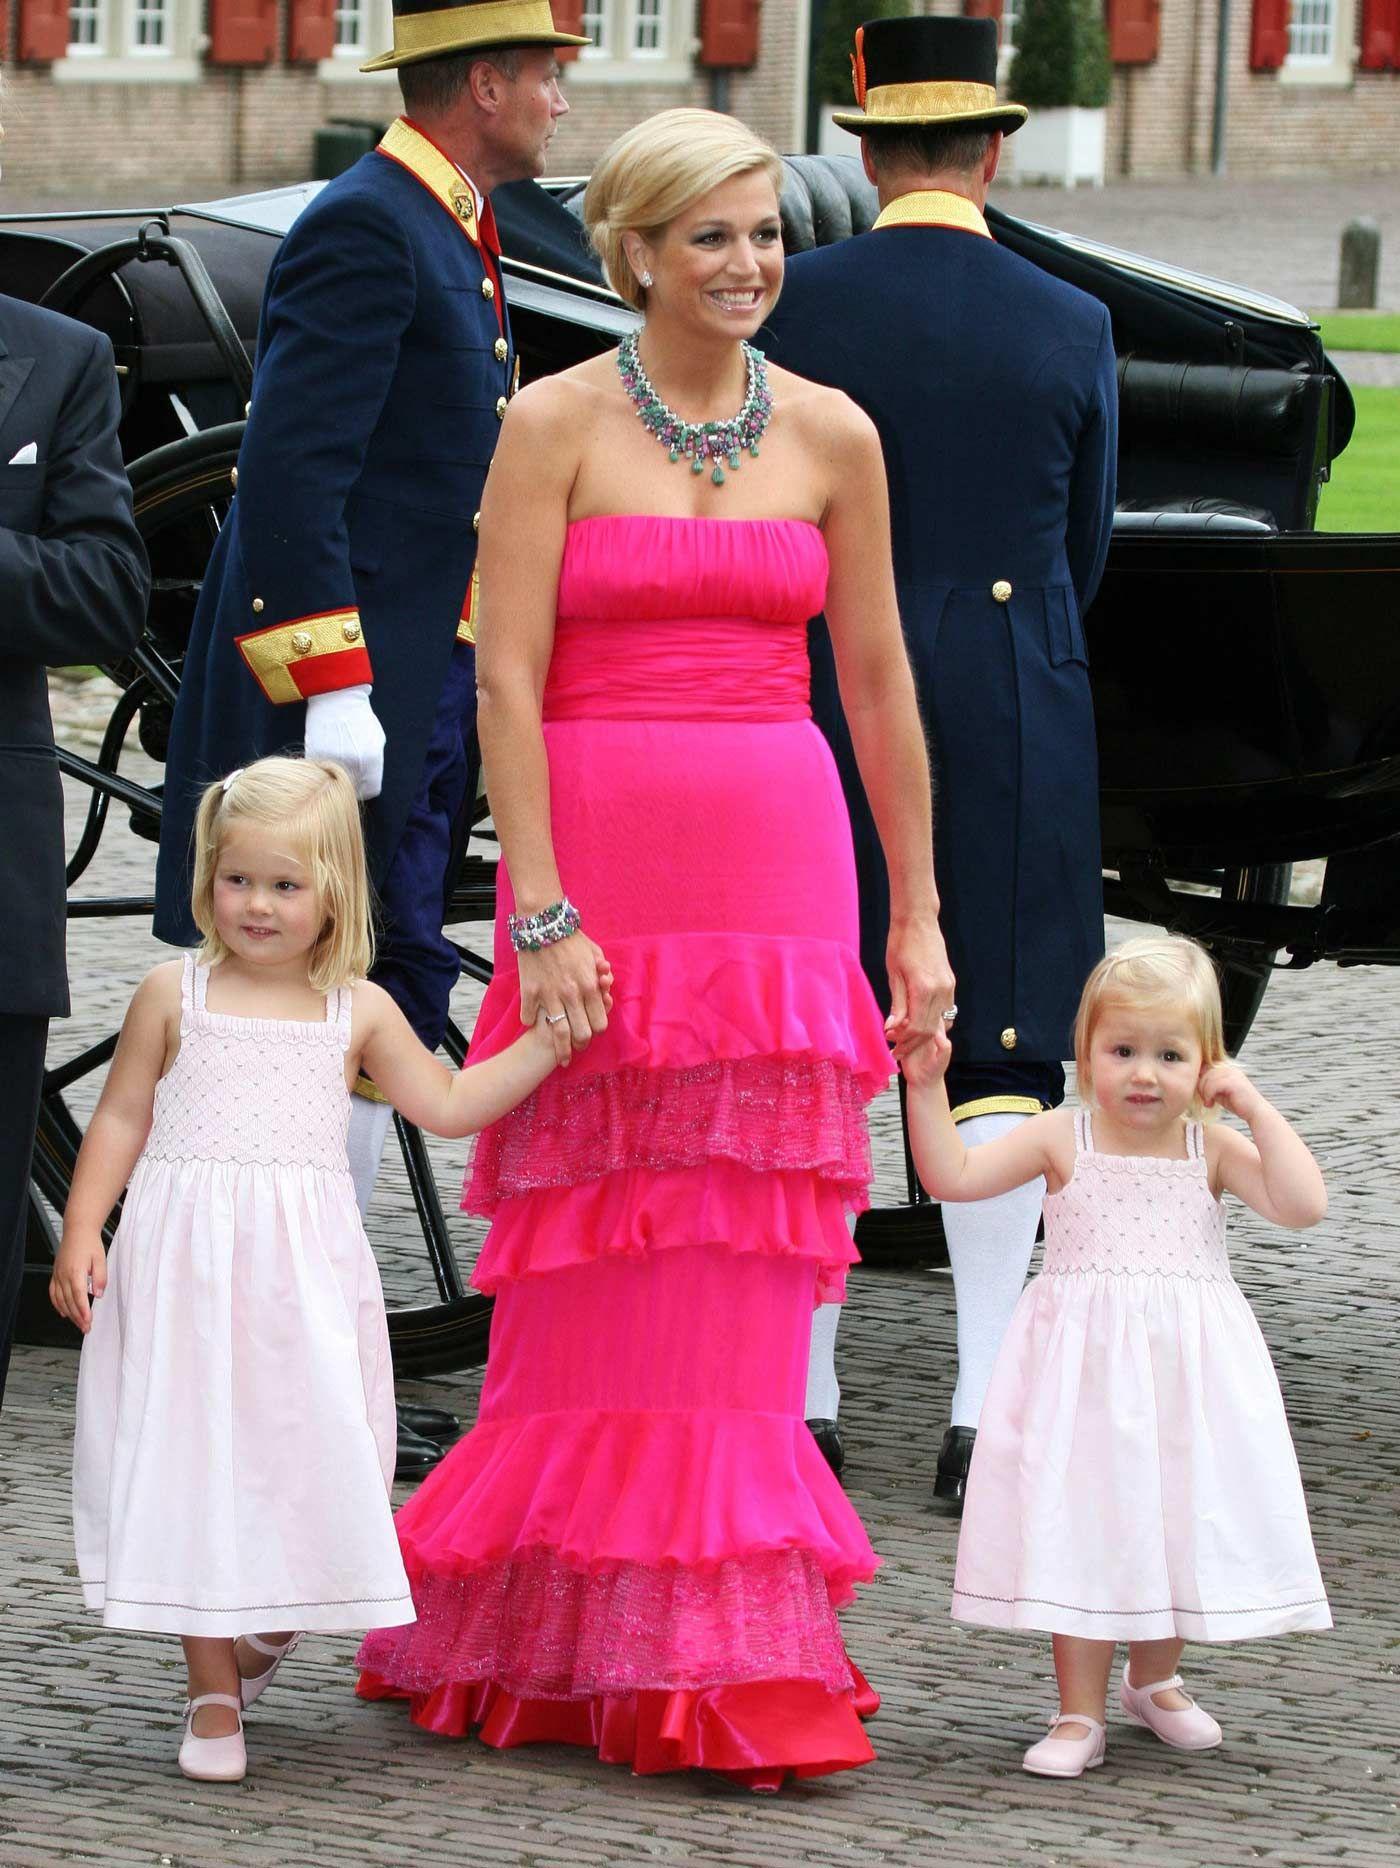 Koningin Maxiam met het tutti frutti collier Blog Zilver.nl